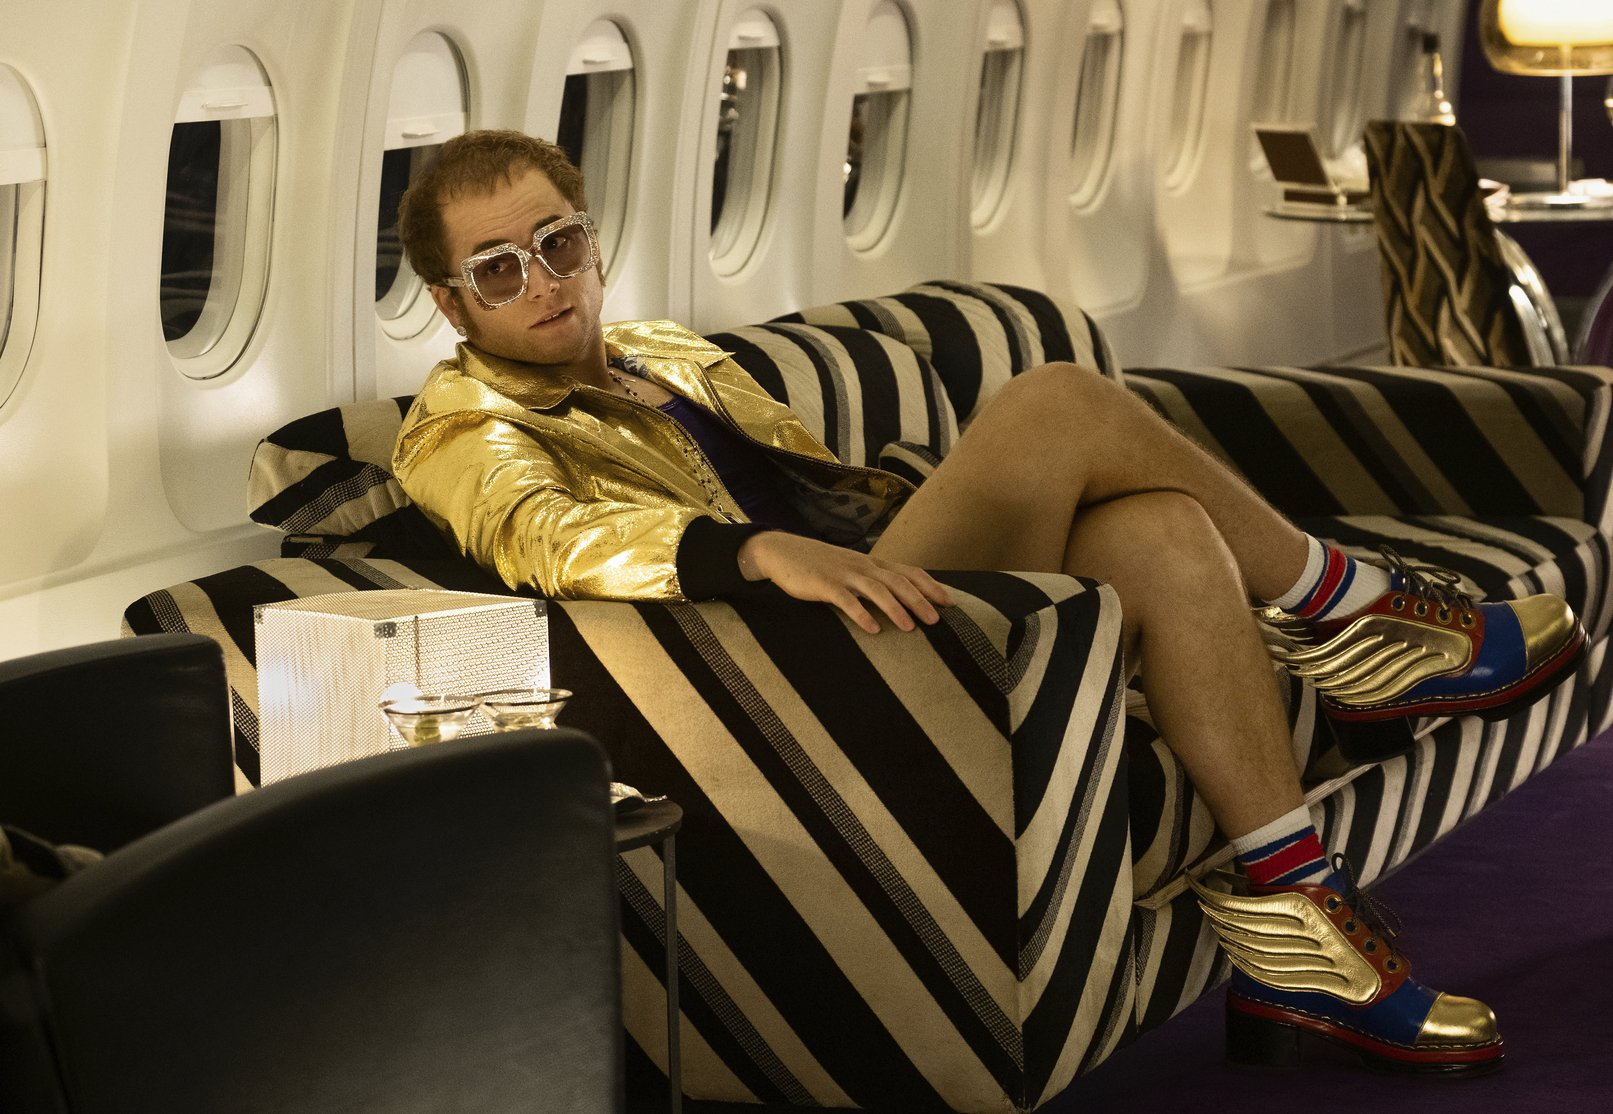 taron egerton shorts in rocketman biopic on elton john images on plane